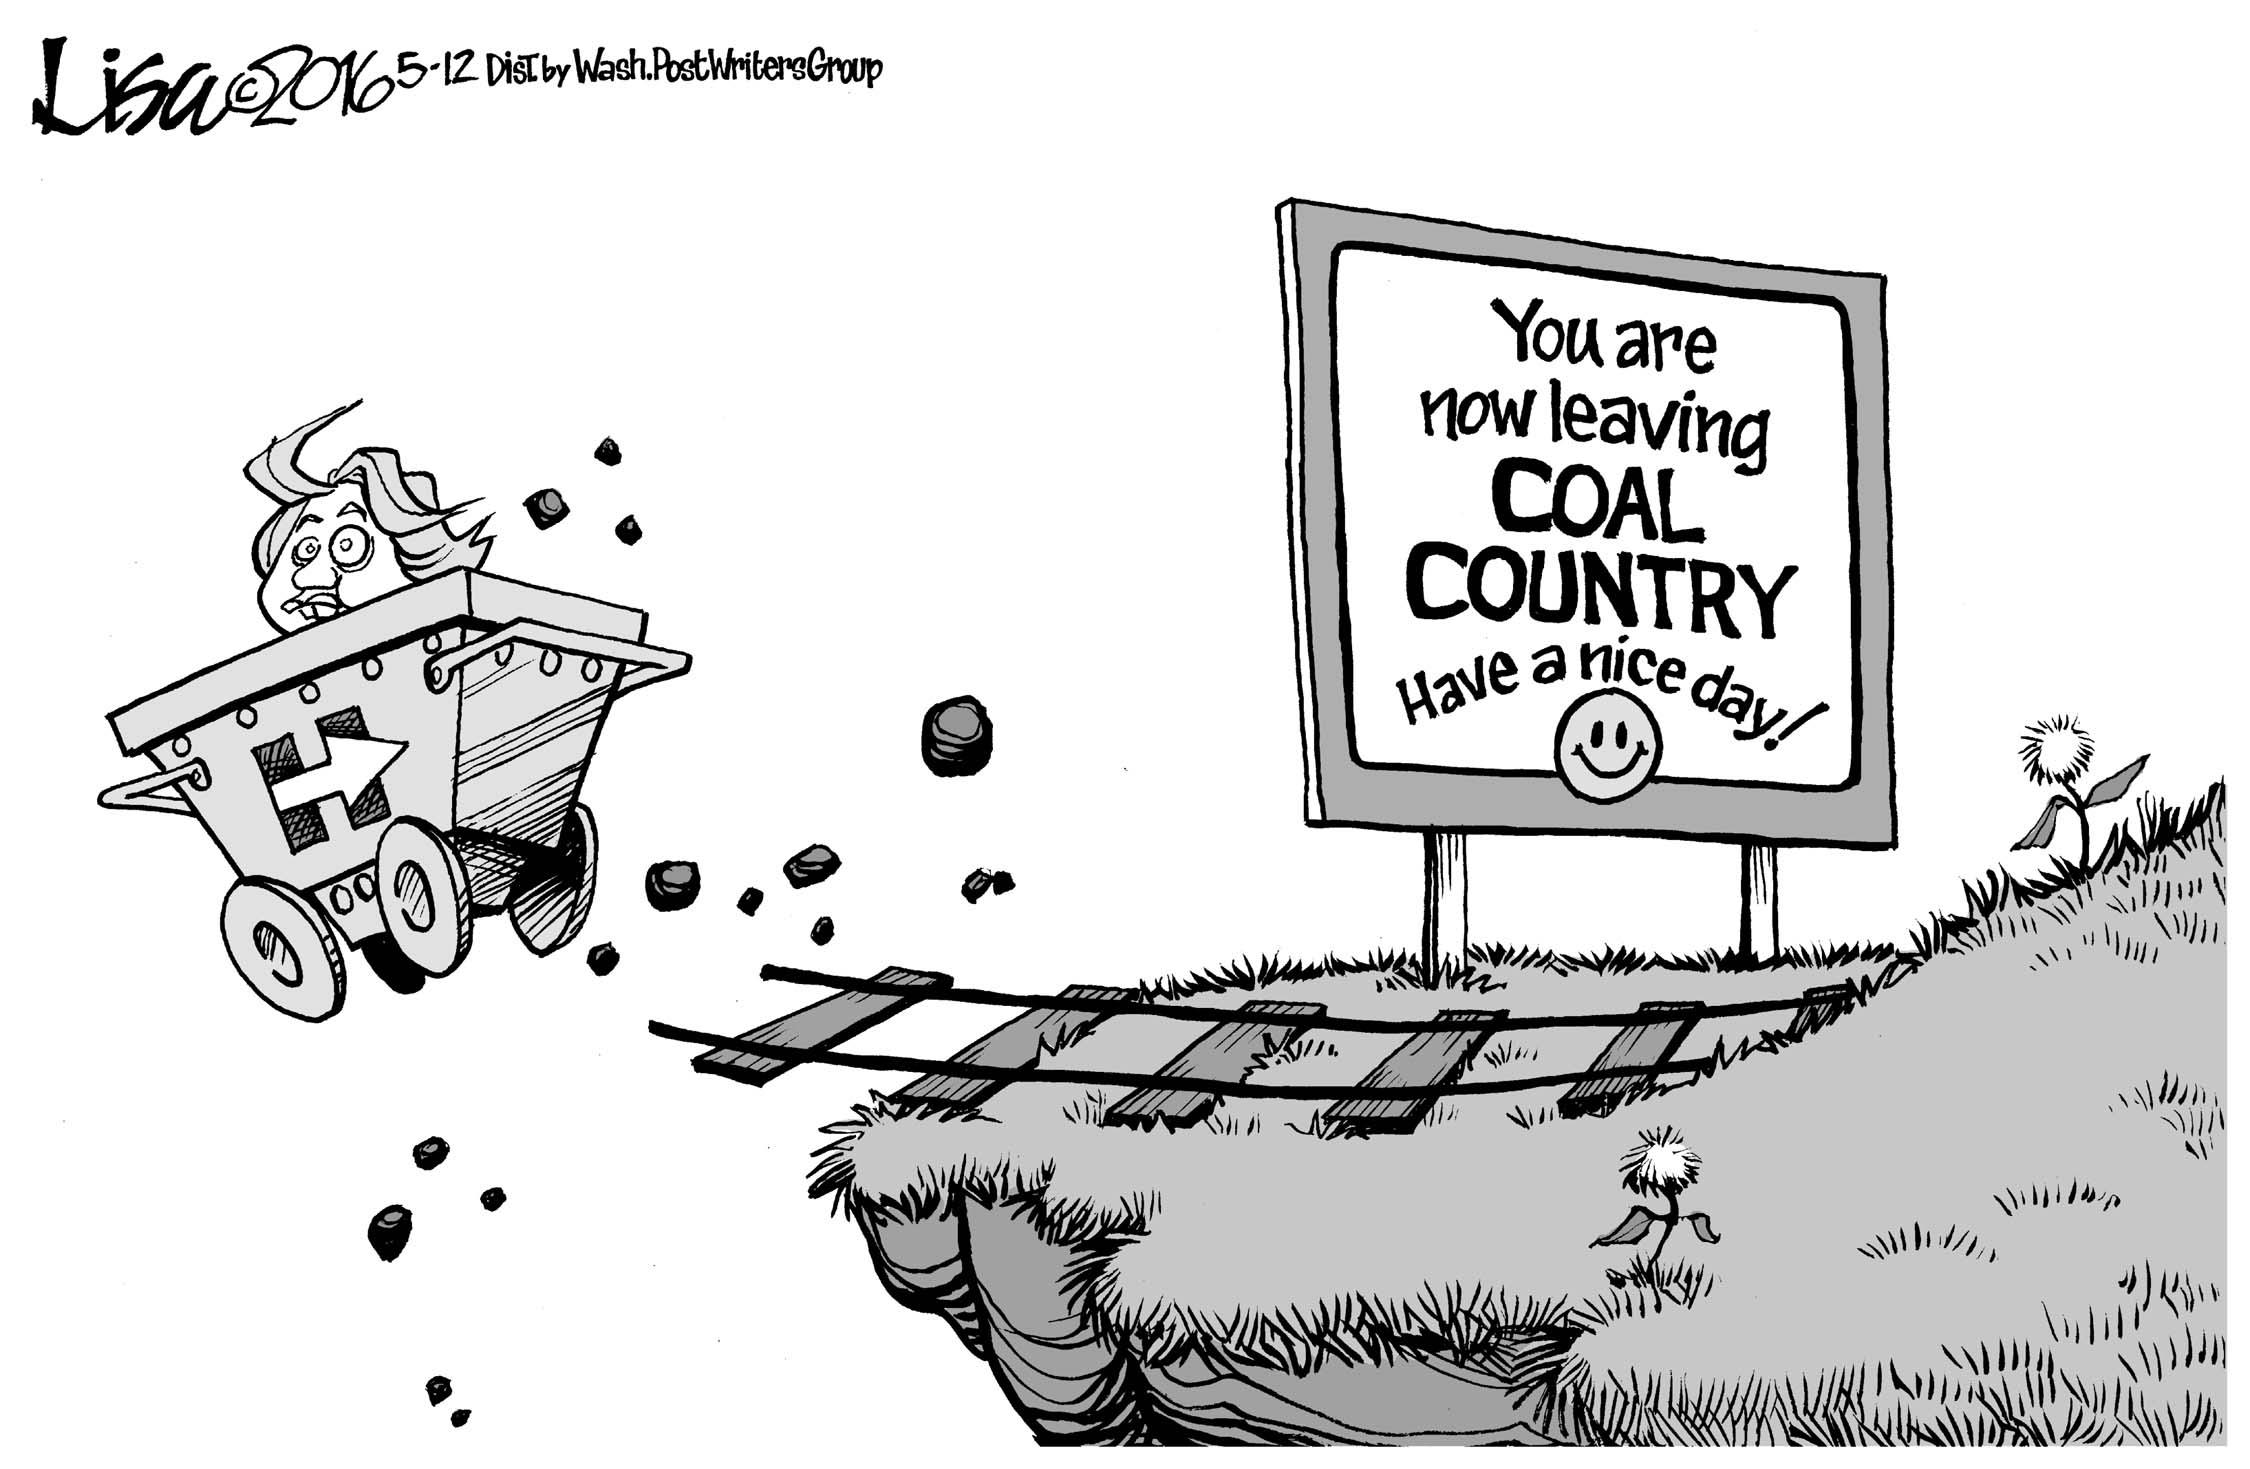 May 14: Hillary And Coal